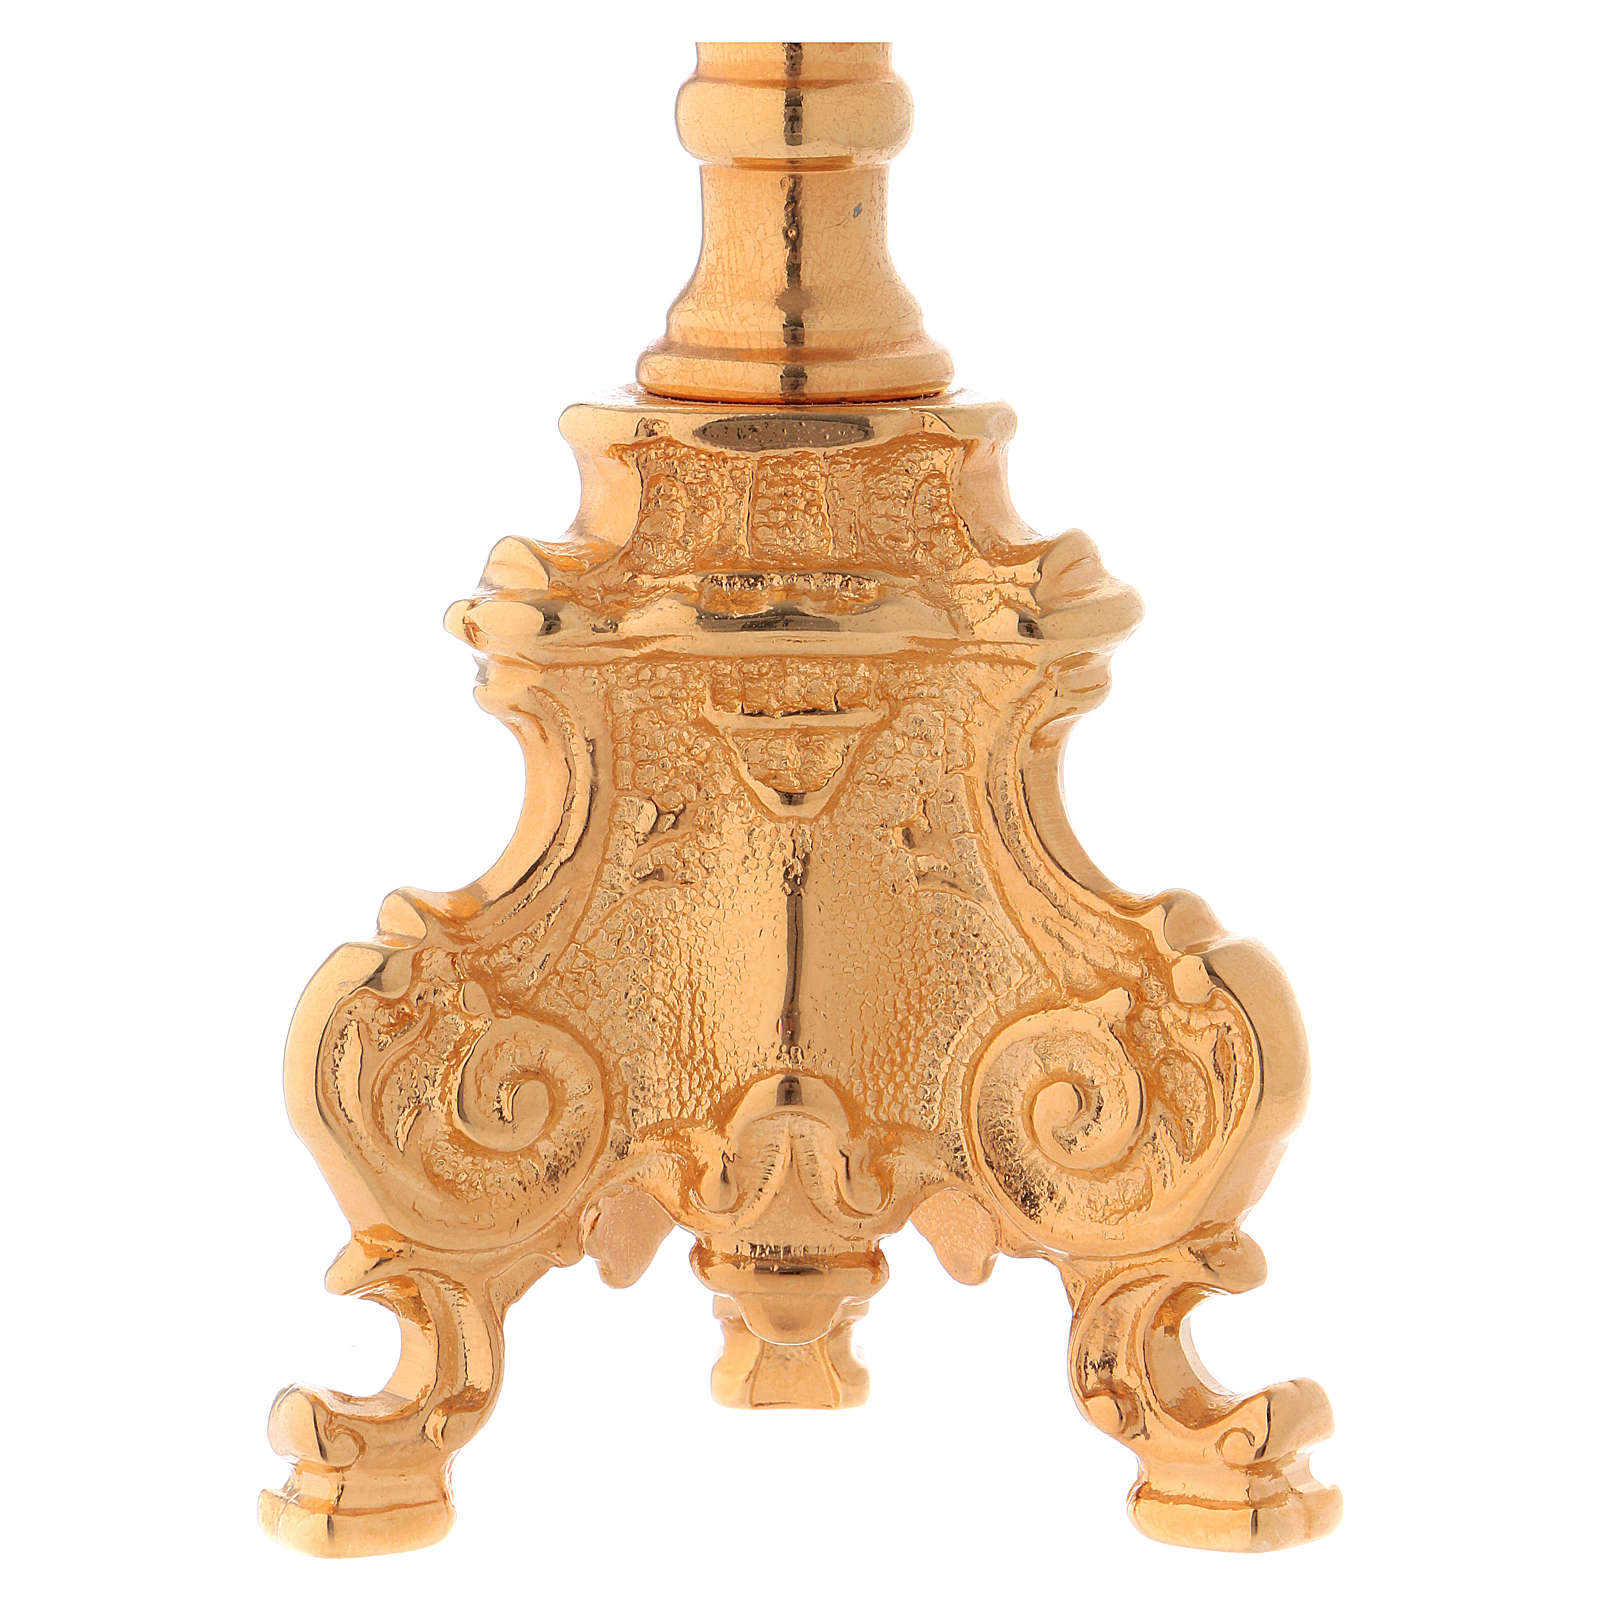 Candelero estilo rococo dorado 4